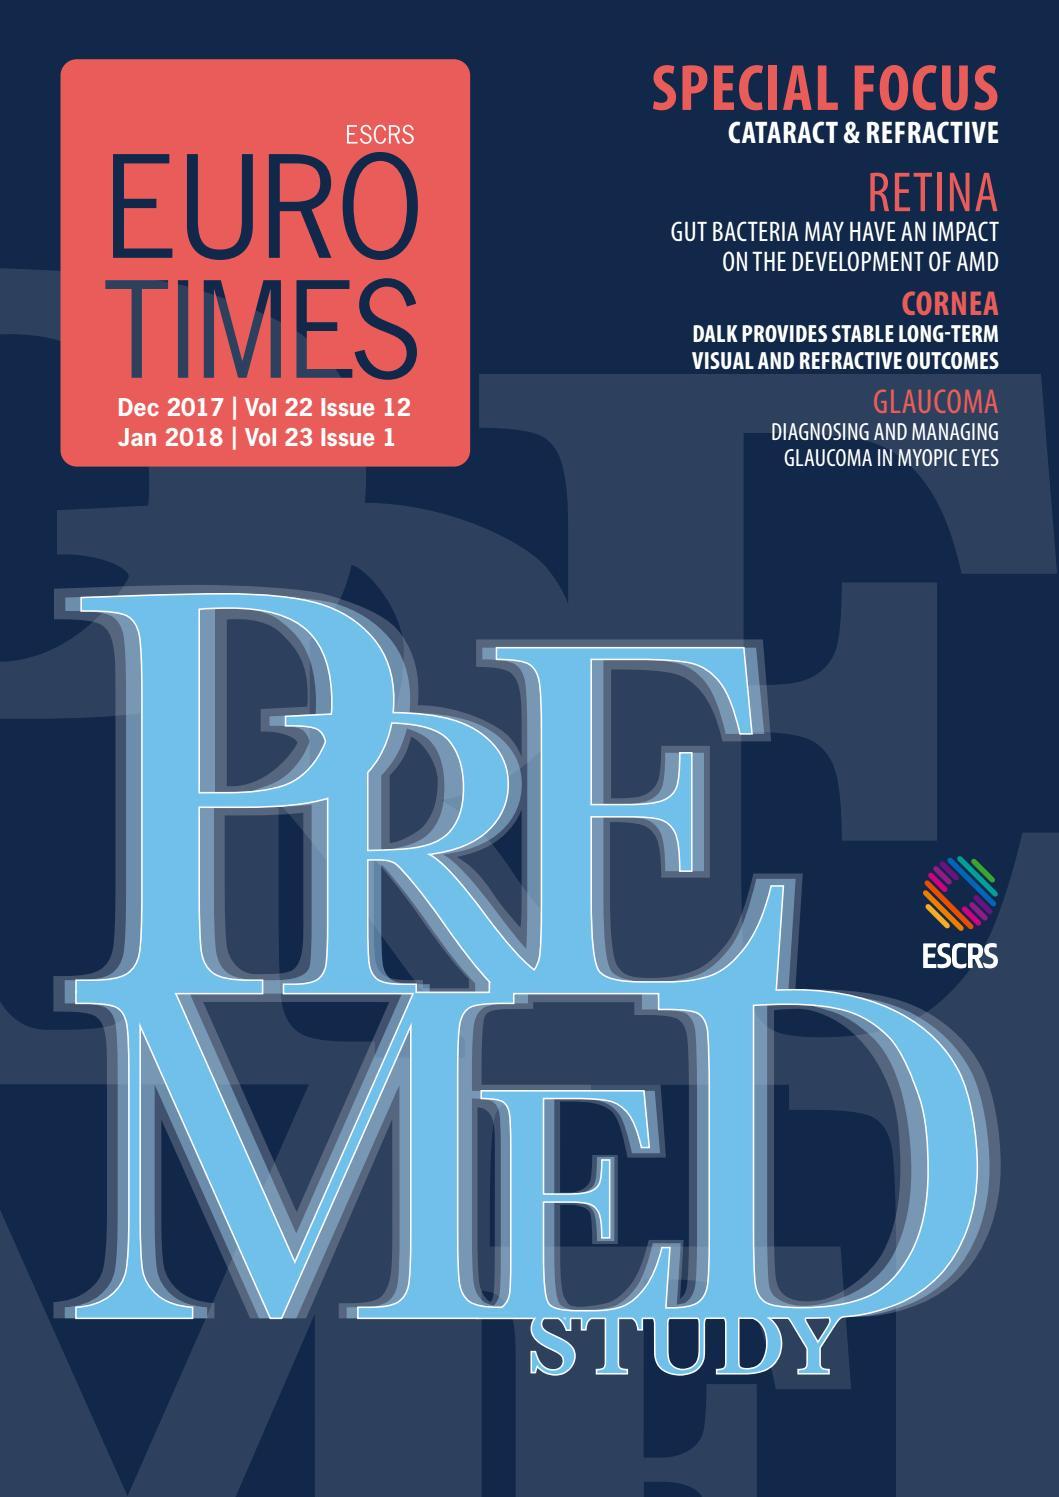 EuroTimes Dec 2017 - Vol 22 Issue 12 | Jan 2018 - Vol 23